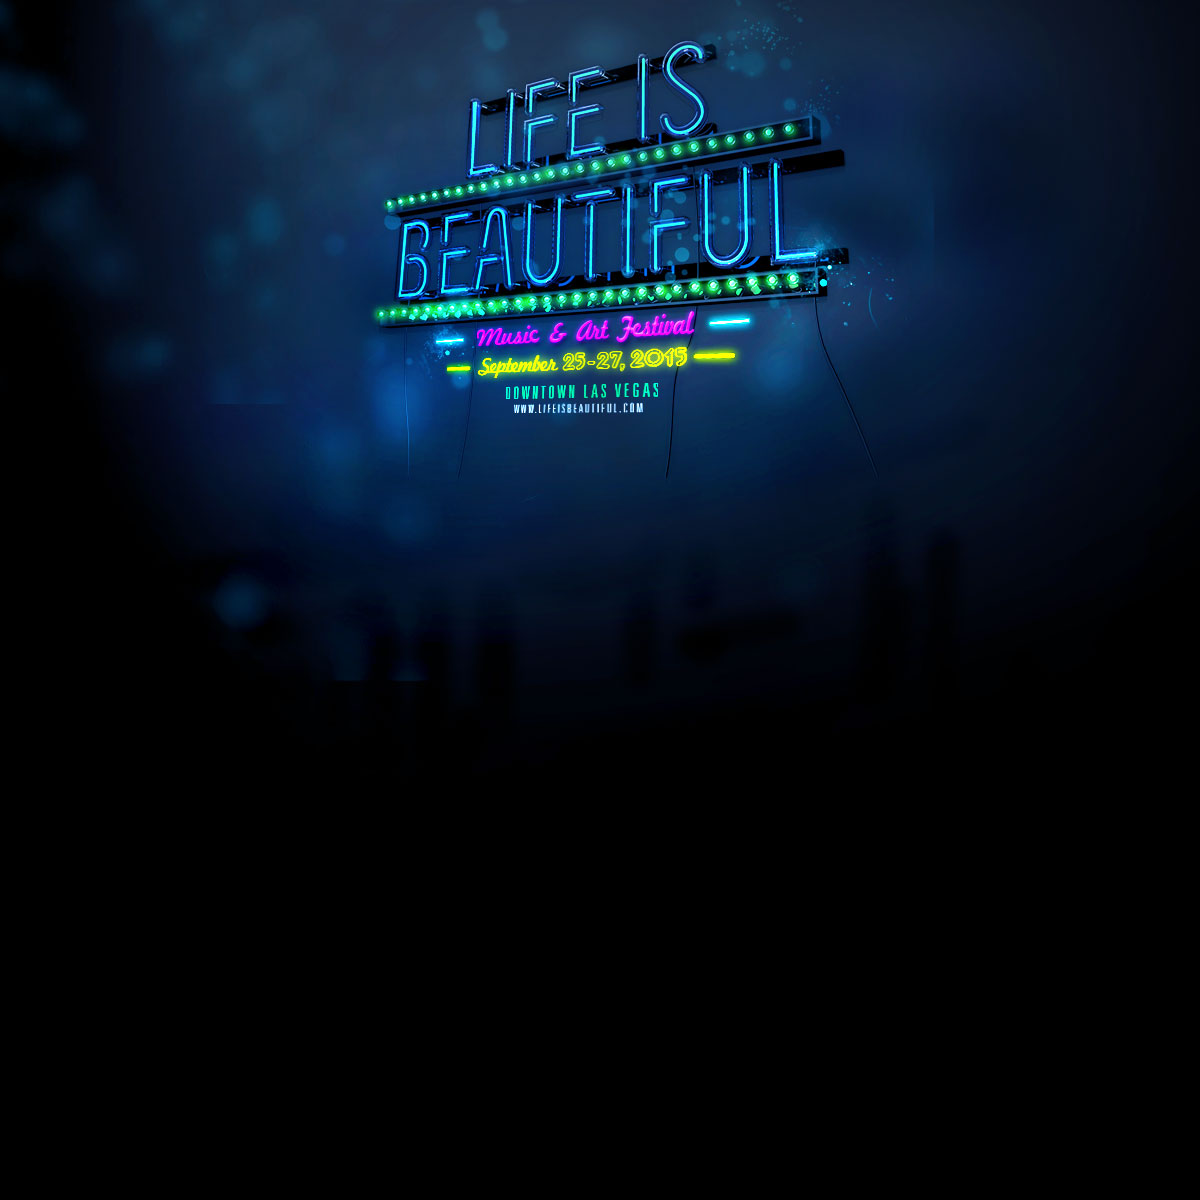 Life Is Beautiful 2015